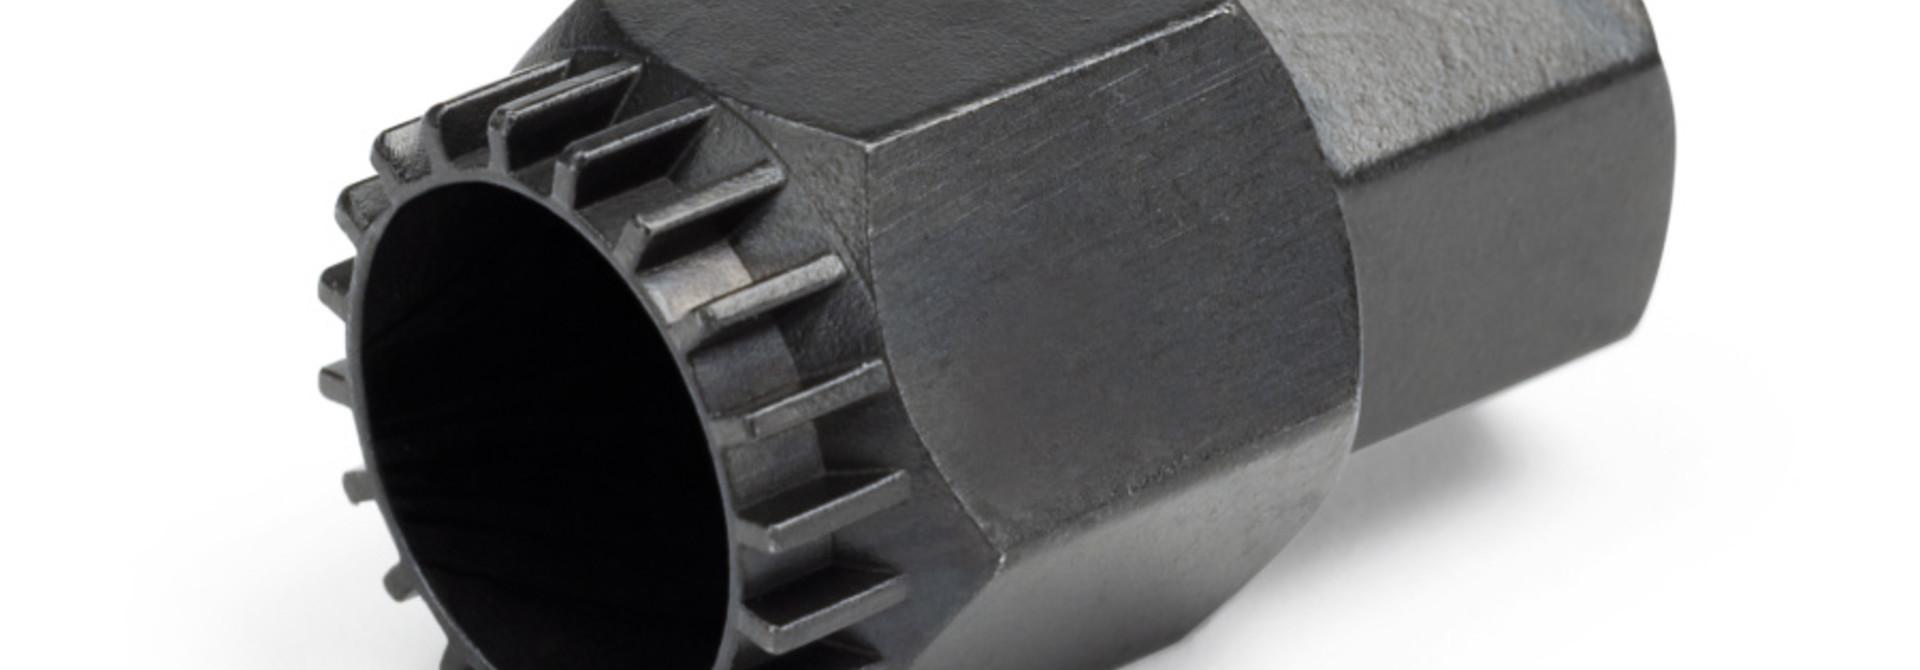 Park Tool, BBT-22, Bottom bracket tool, Cartridge type, For 3/8'' drive ratchet